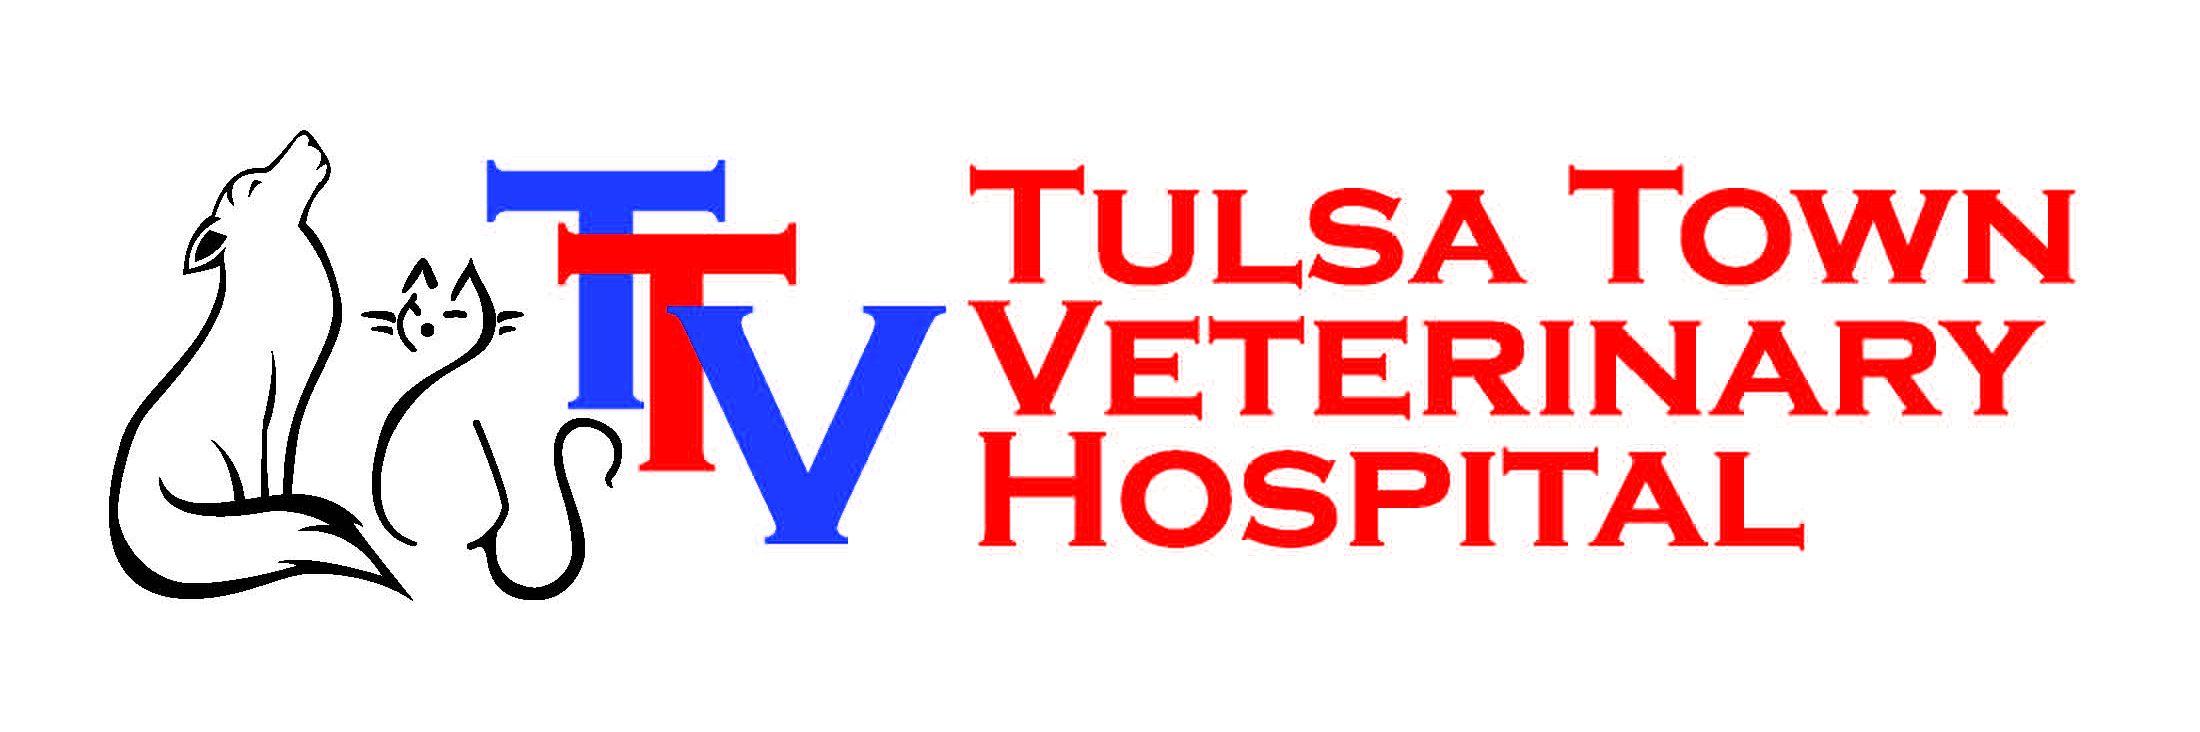 Tulsa Town Vet Hospital (918) 794-5566